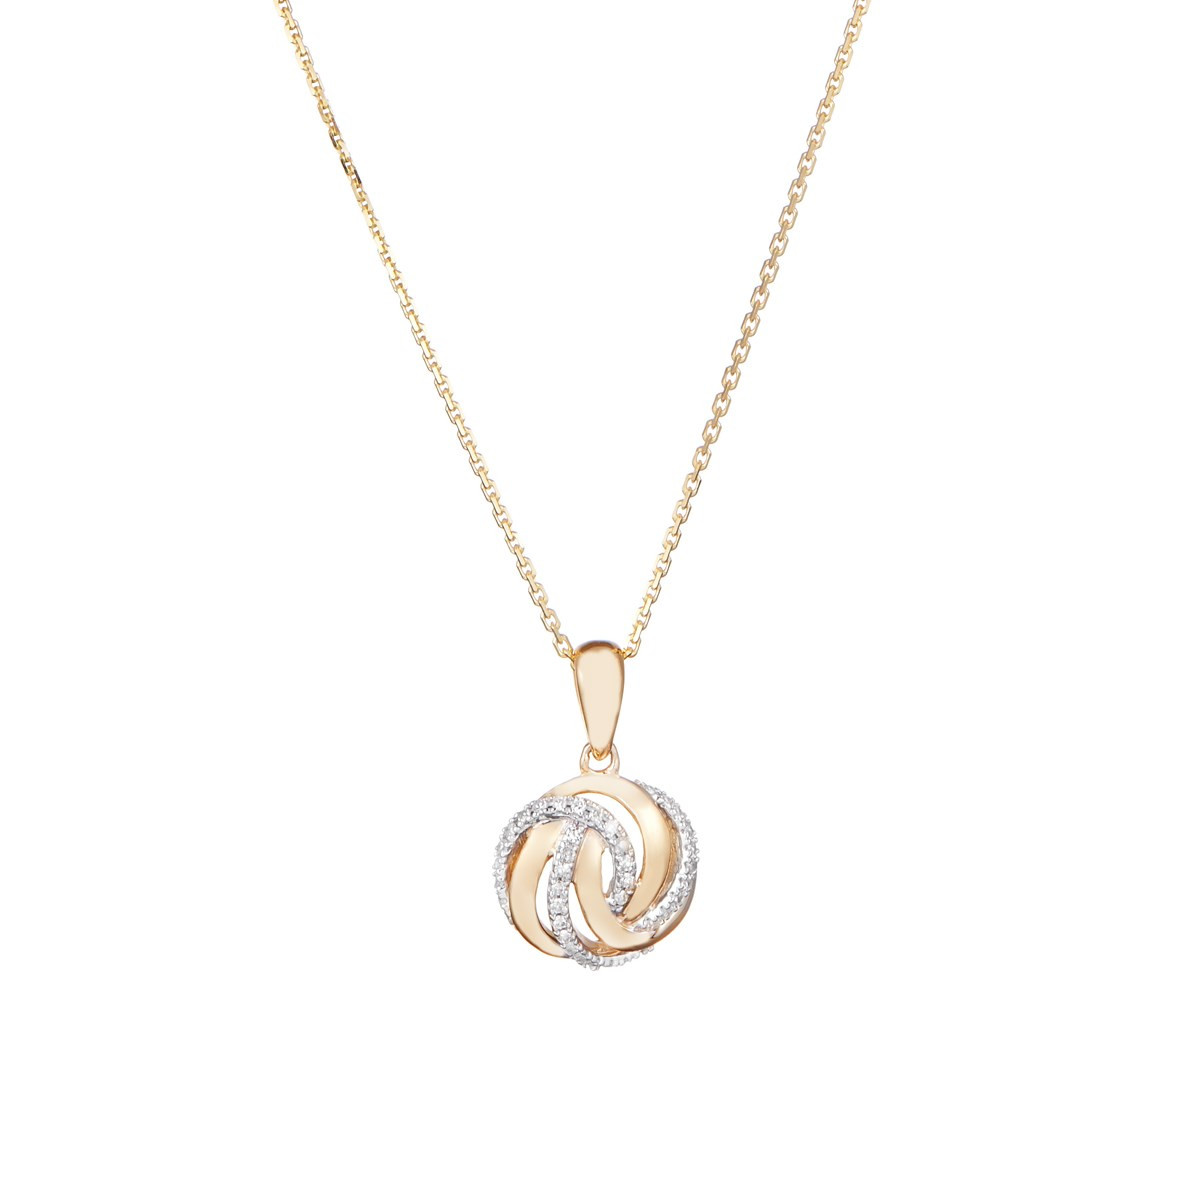 Pendentif Or Jaune GOLDEN EYE Diamants 0,09 carat + chaîne vermeil offerte